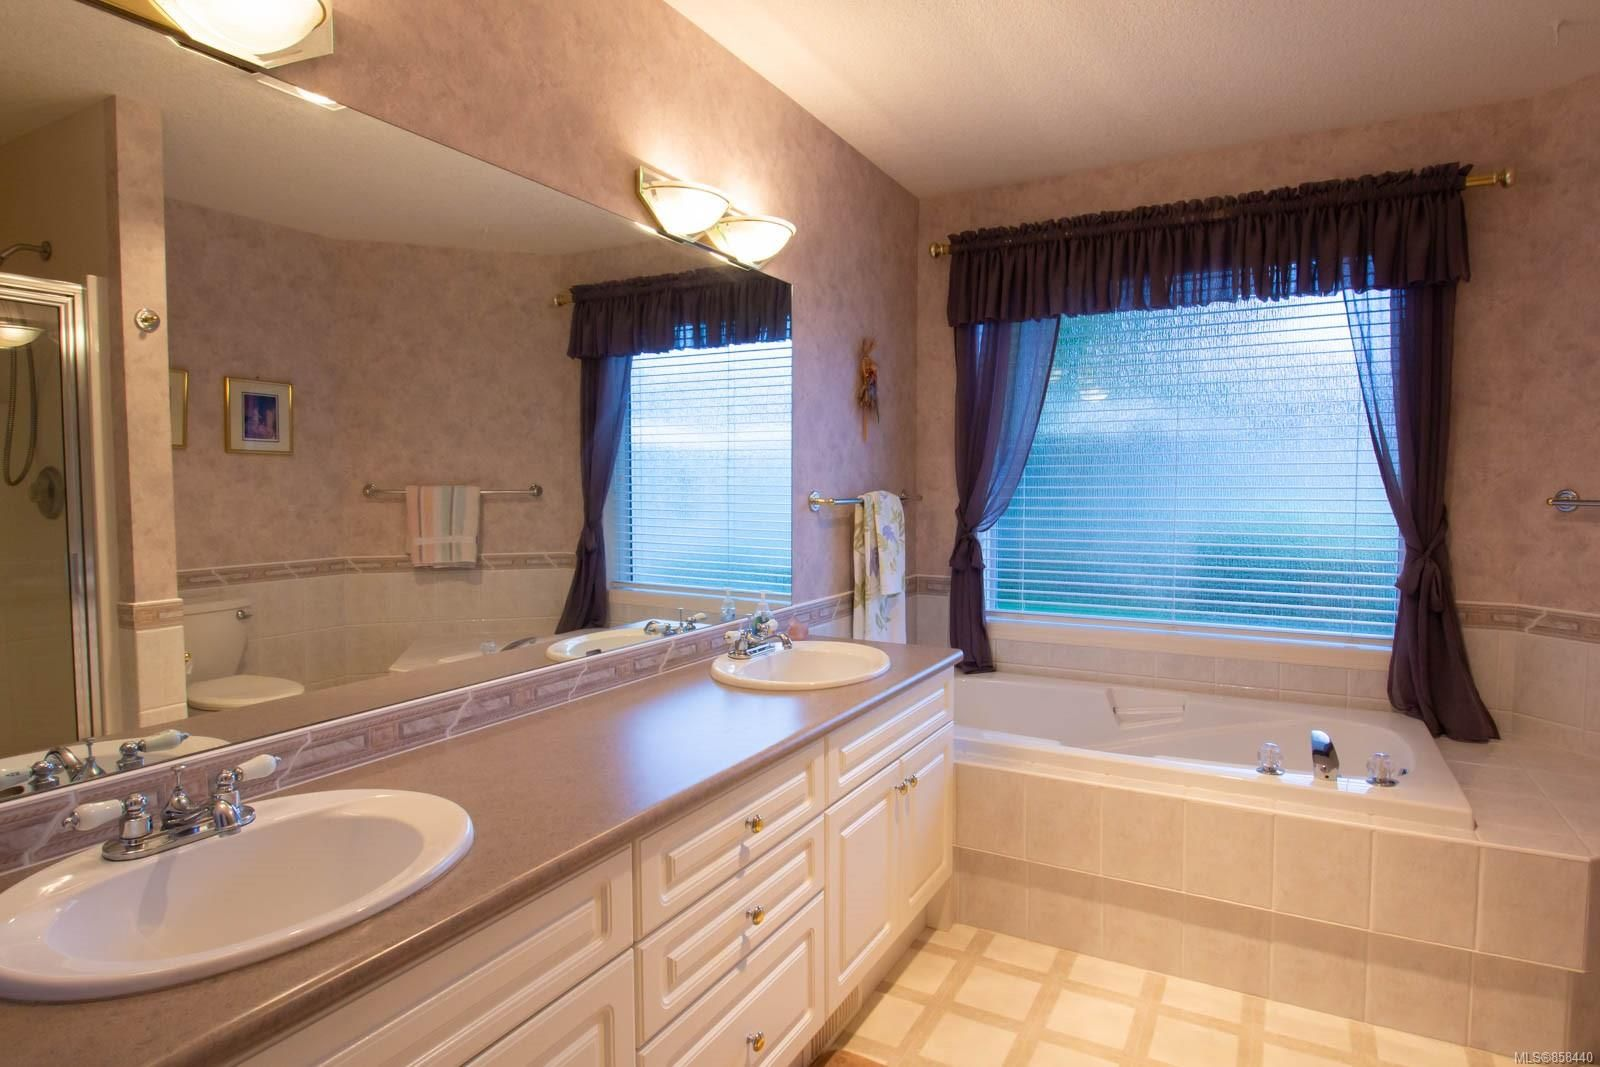 Photo 20: Photos: 798 Devon Pl in : PQ Qualicum Beach House for sale (Parksville/Qualicum)  : MLS®# 858440